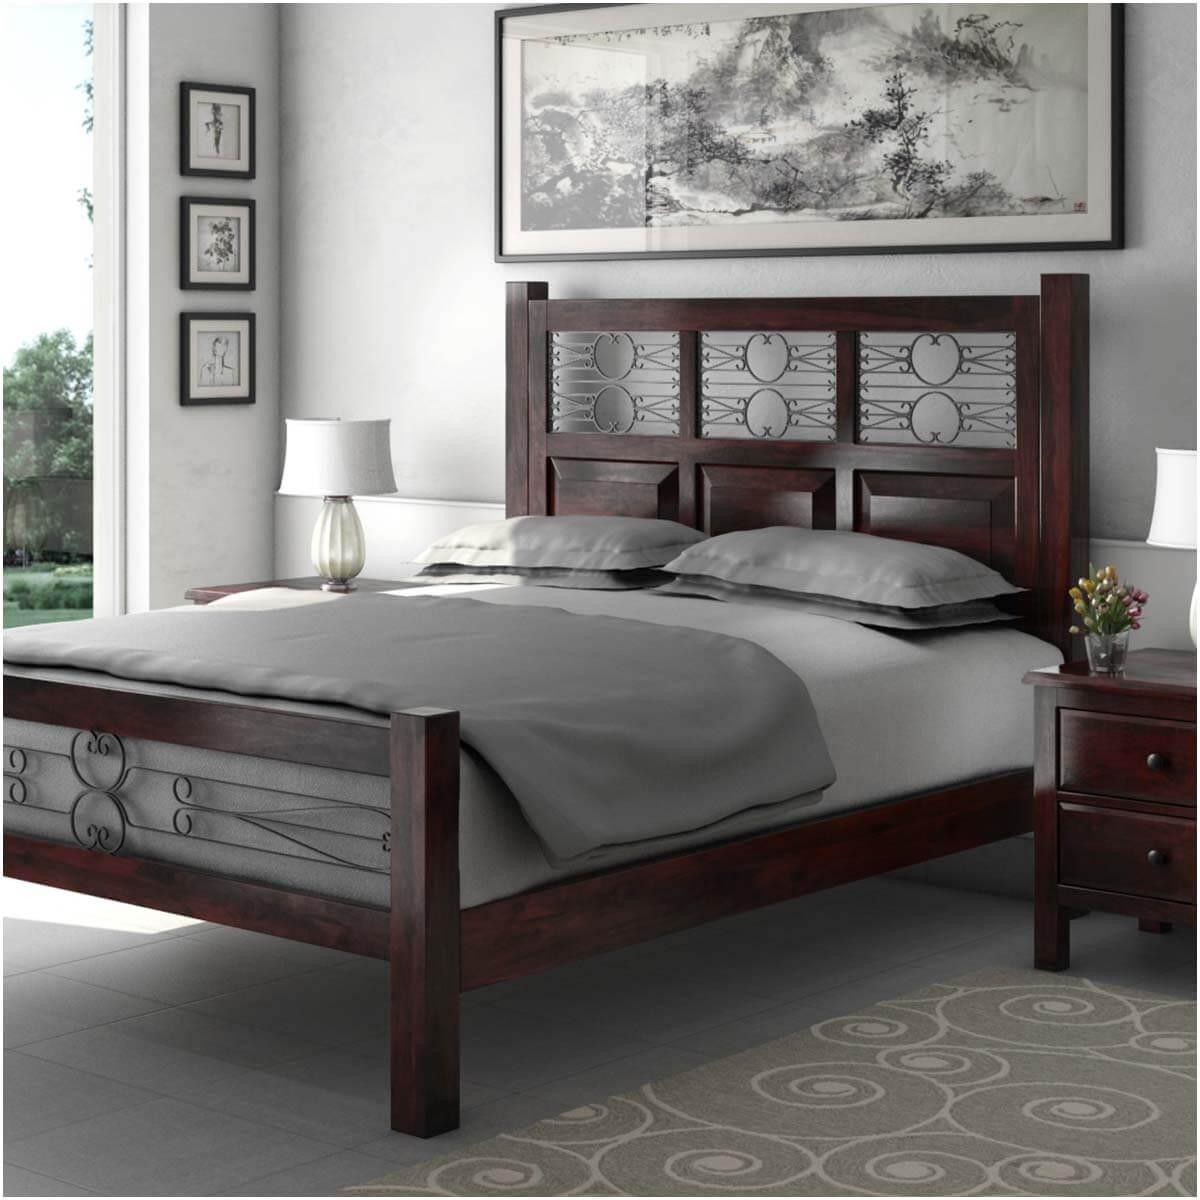 Mission Romance Solid Wood & Iron Platform Bed